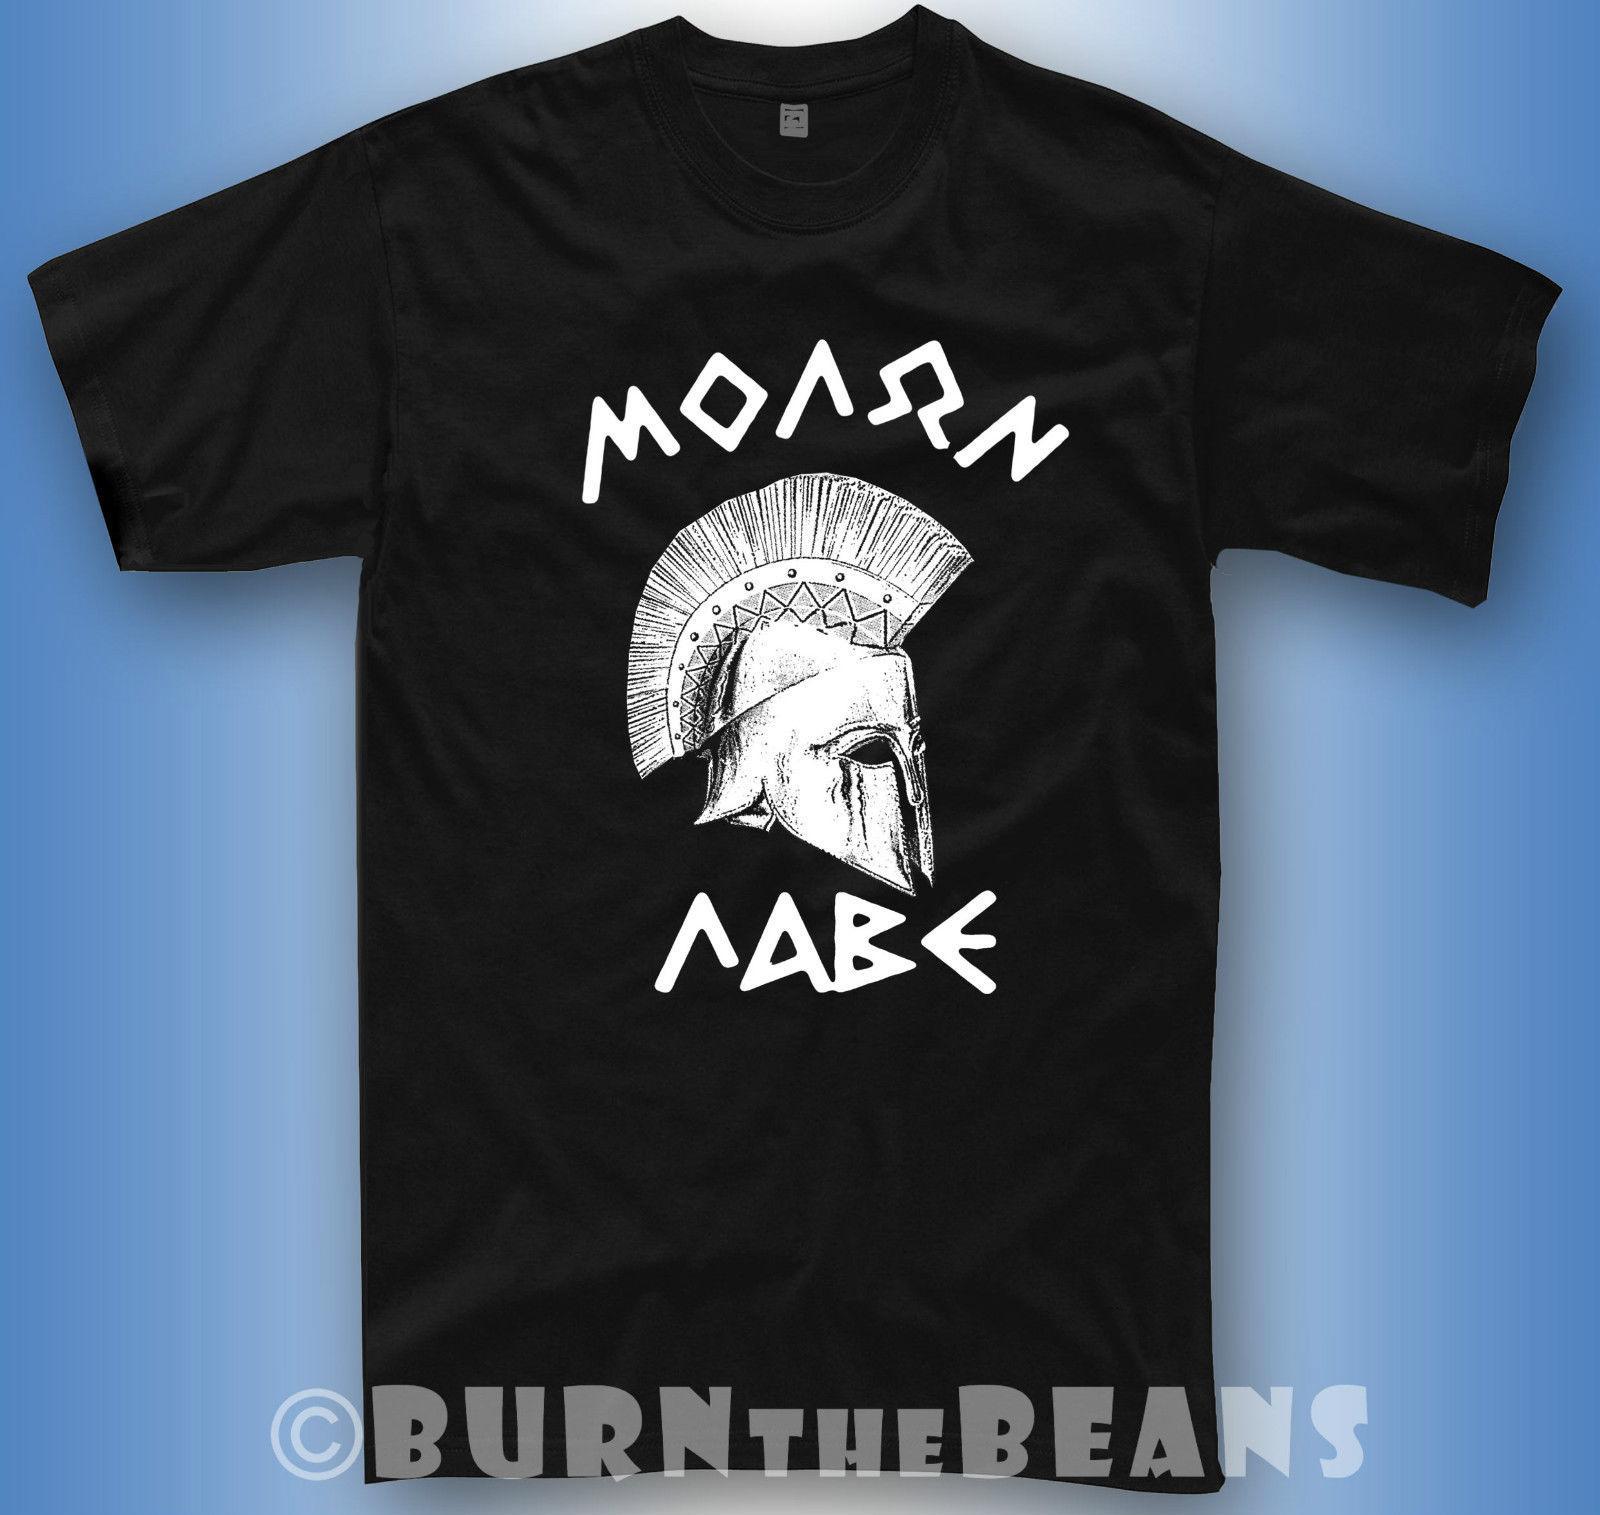 spartan t shirt  Spartans t-shirt Sparta Greece helmet gym 300 molon labe tshirt + long  sleeve summer Hot Sale New Tee Print Men T-Shirt Top Mens 2018 New